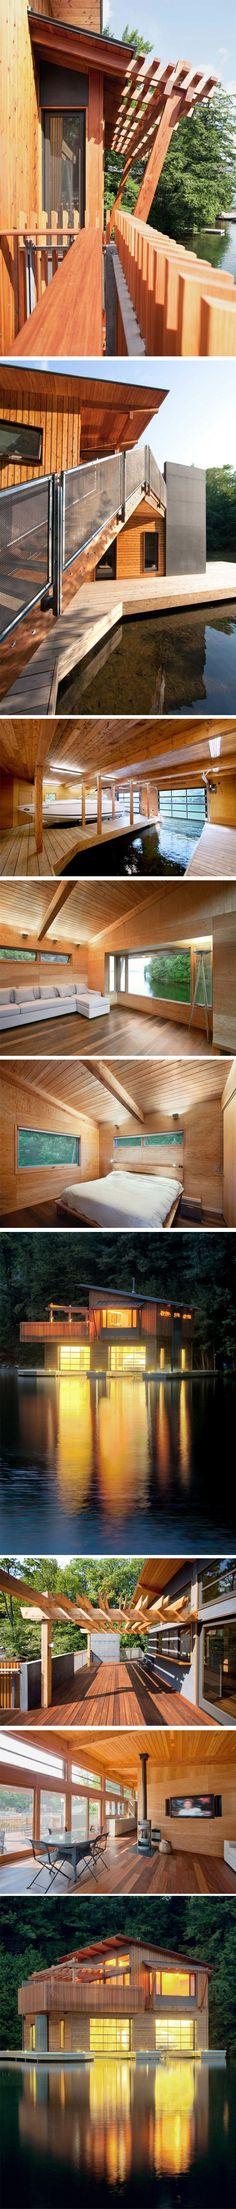 Muskoka Boathouse by Christopher Simmonds Architect. Canada